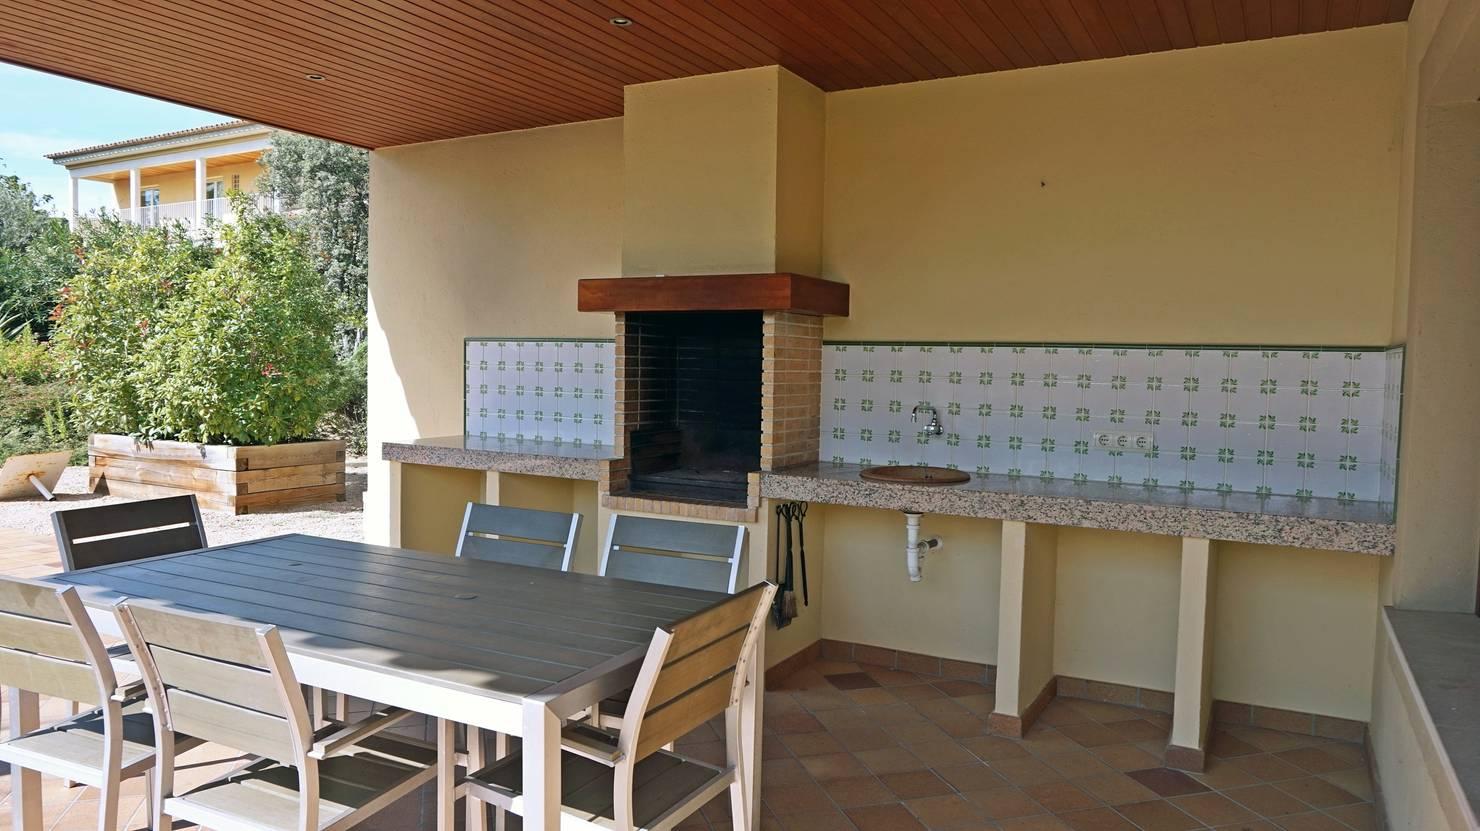 Home improvement: 11 DIY patio kitchens